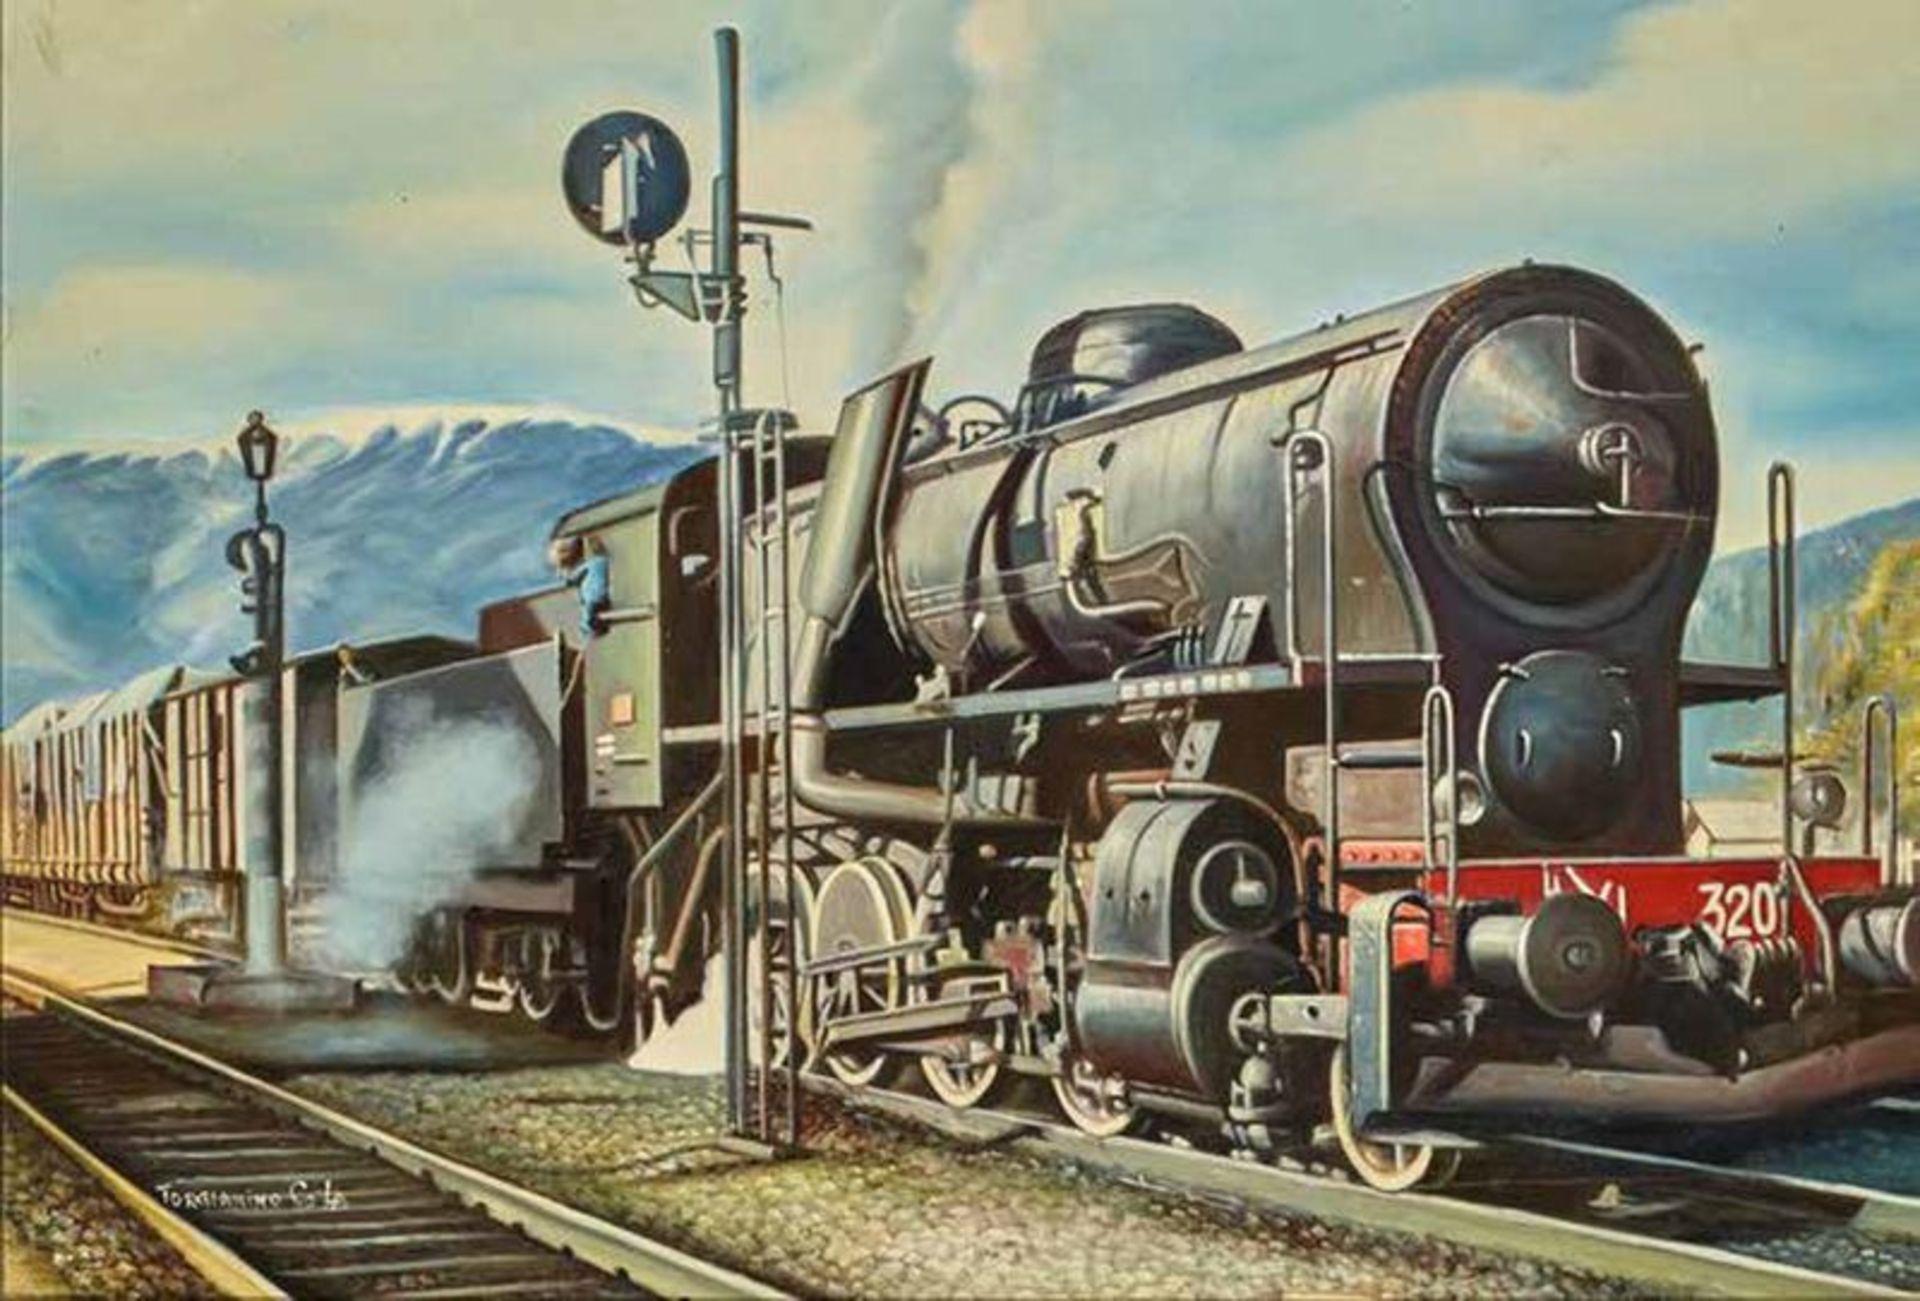 Torgianino C. Locomotive - signed 'Torgianino Co La' Oil on canvas 60 x 90 cm - [...]